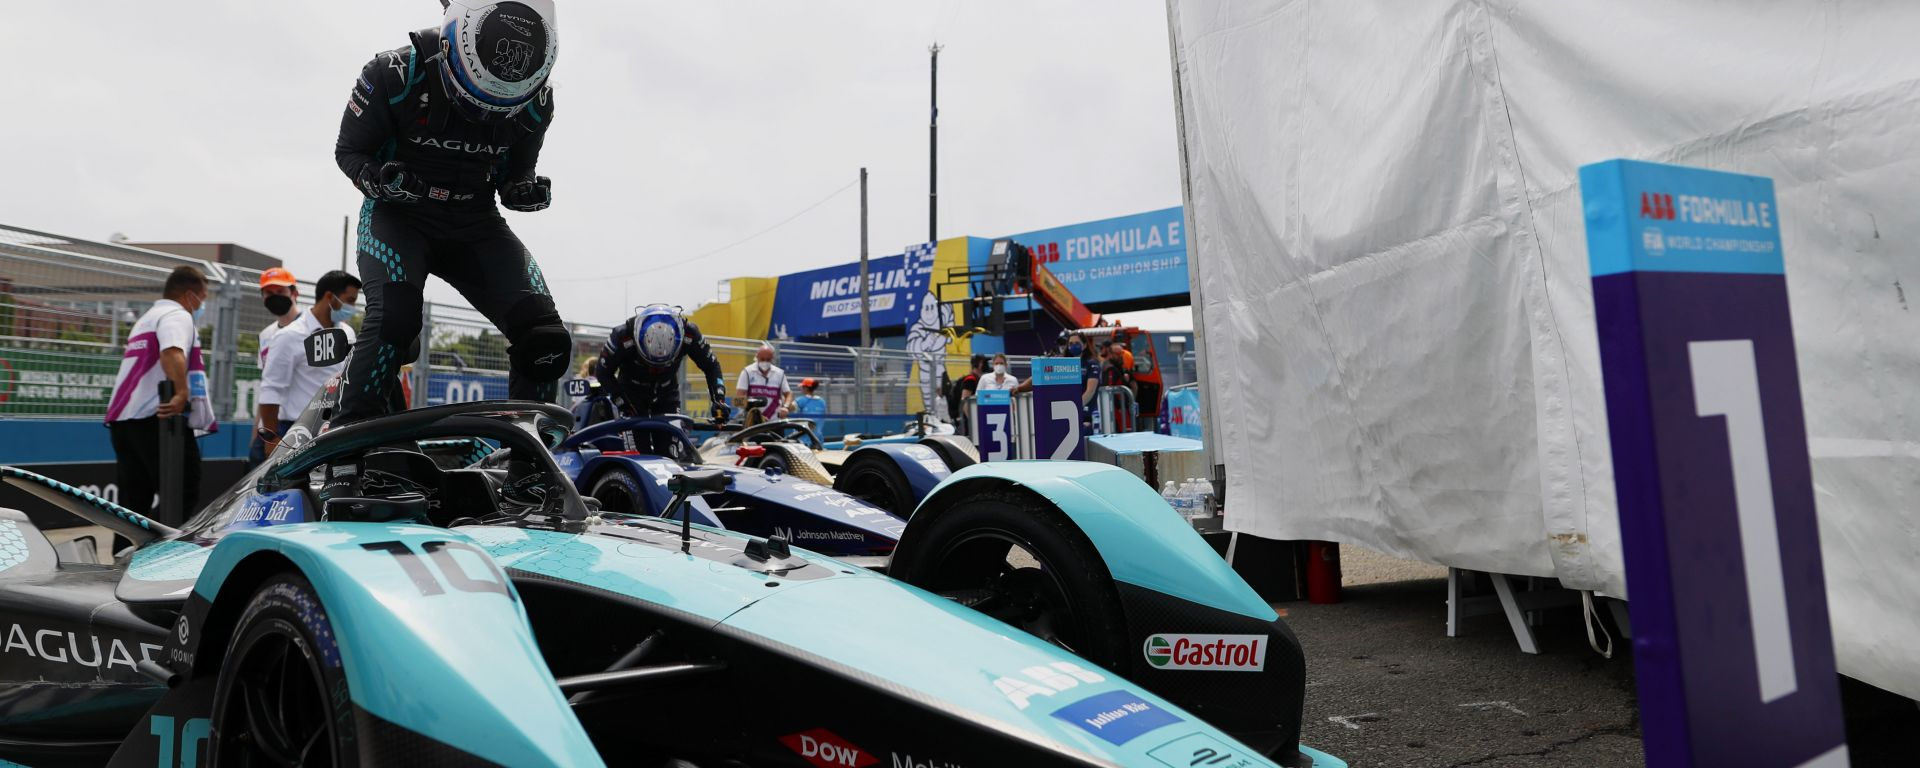 Formula E ePrix New York 2021, Brooklyn: Sam Bird (Jaguar Racing) festeggia dopo il traguardo